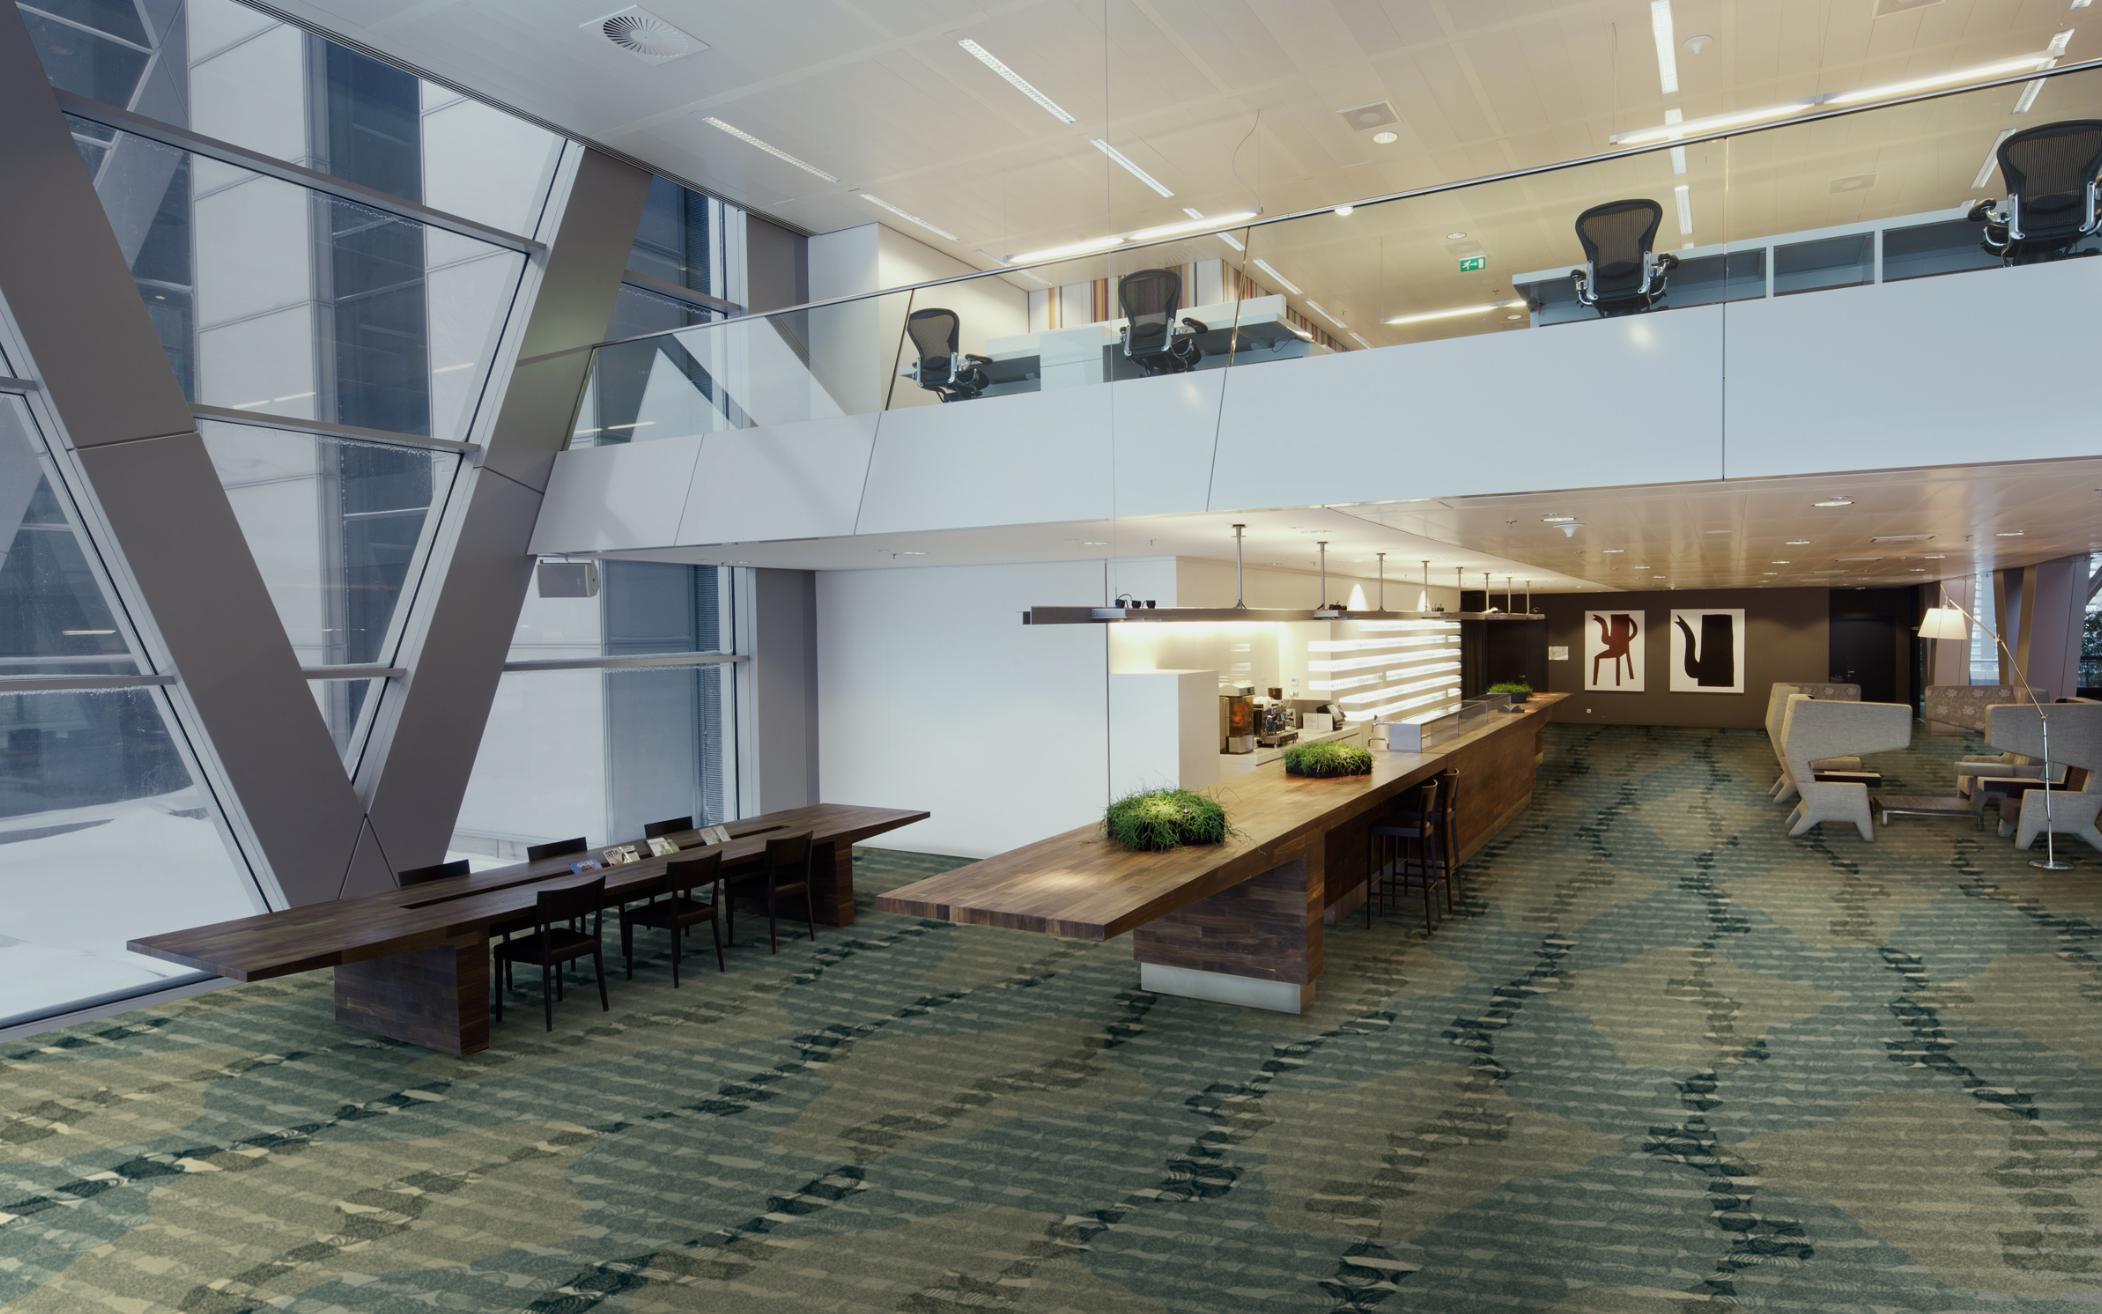 Carpet: Floorfashion collection Iro by Ege carpet